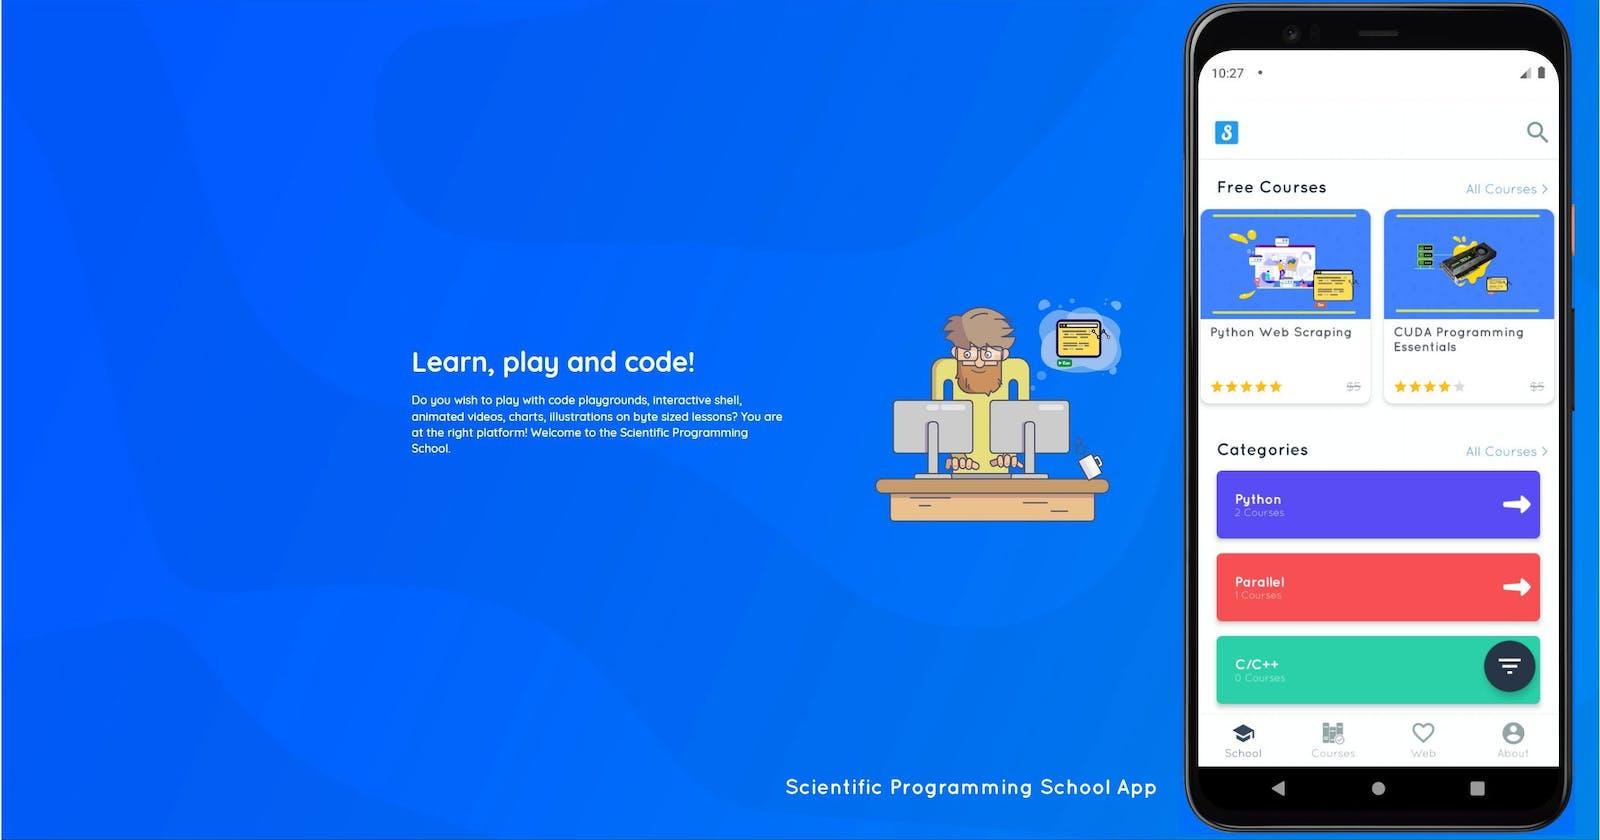 Scientific Programming School — Mobile App